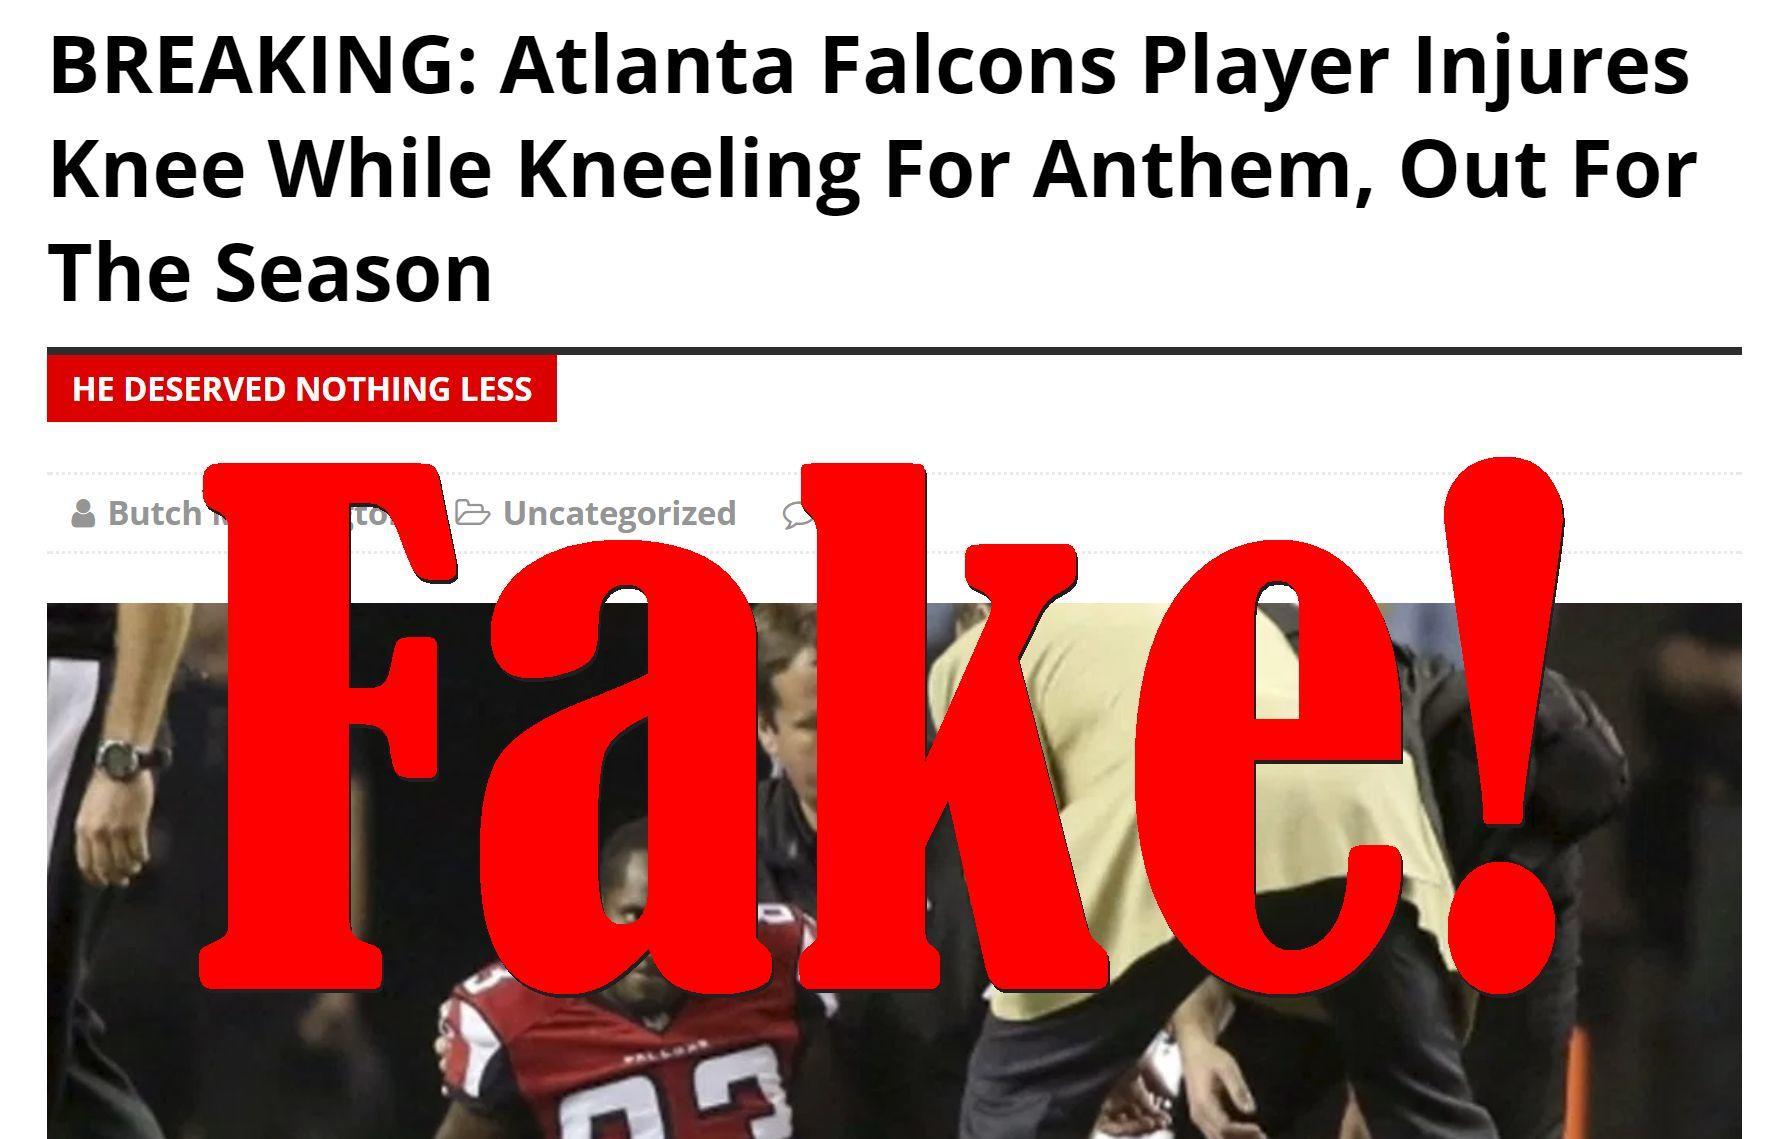 Fake News: Atlanta Falcons Player Did NOT Injure Knee While Kneeling For Anthem